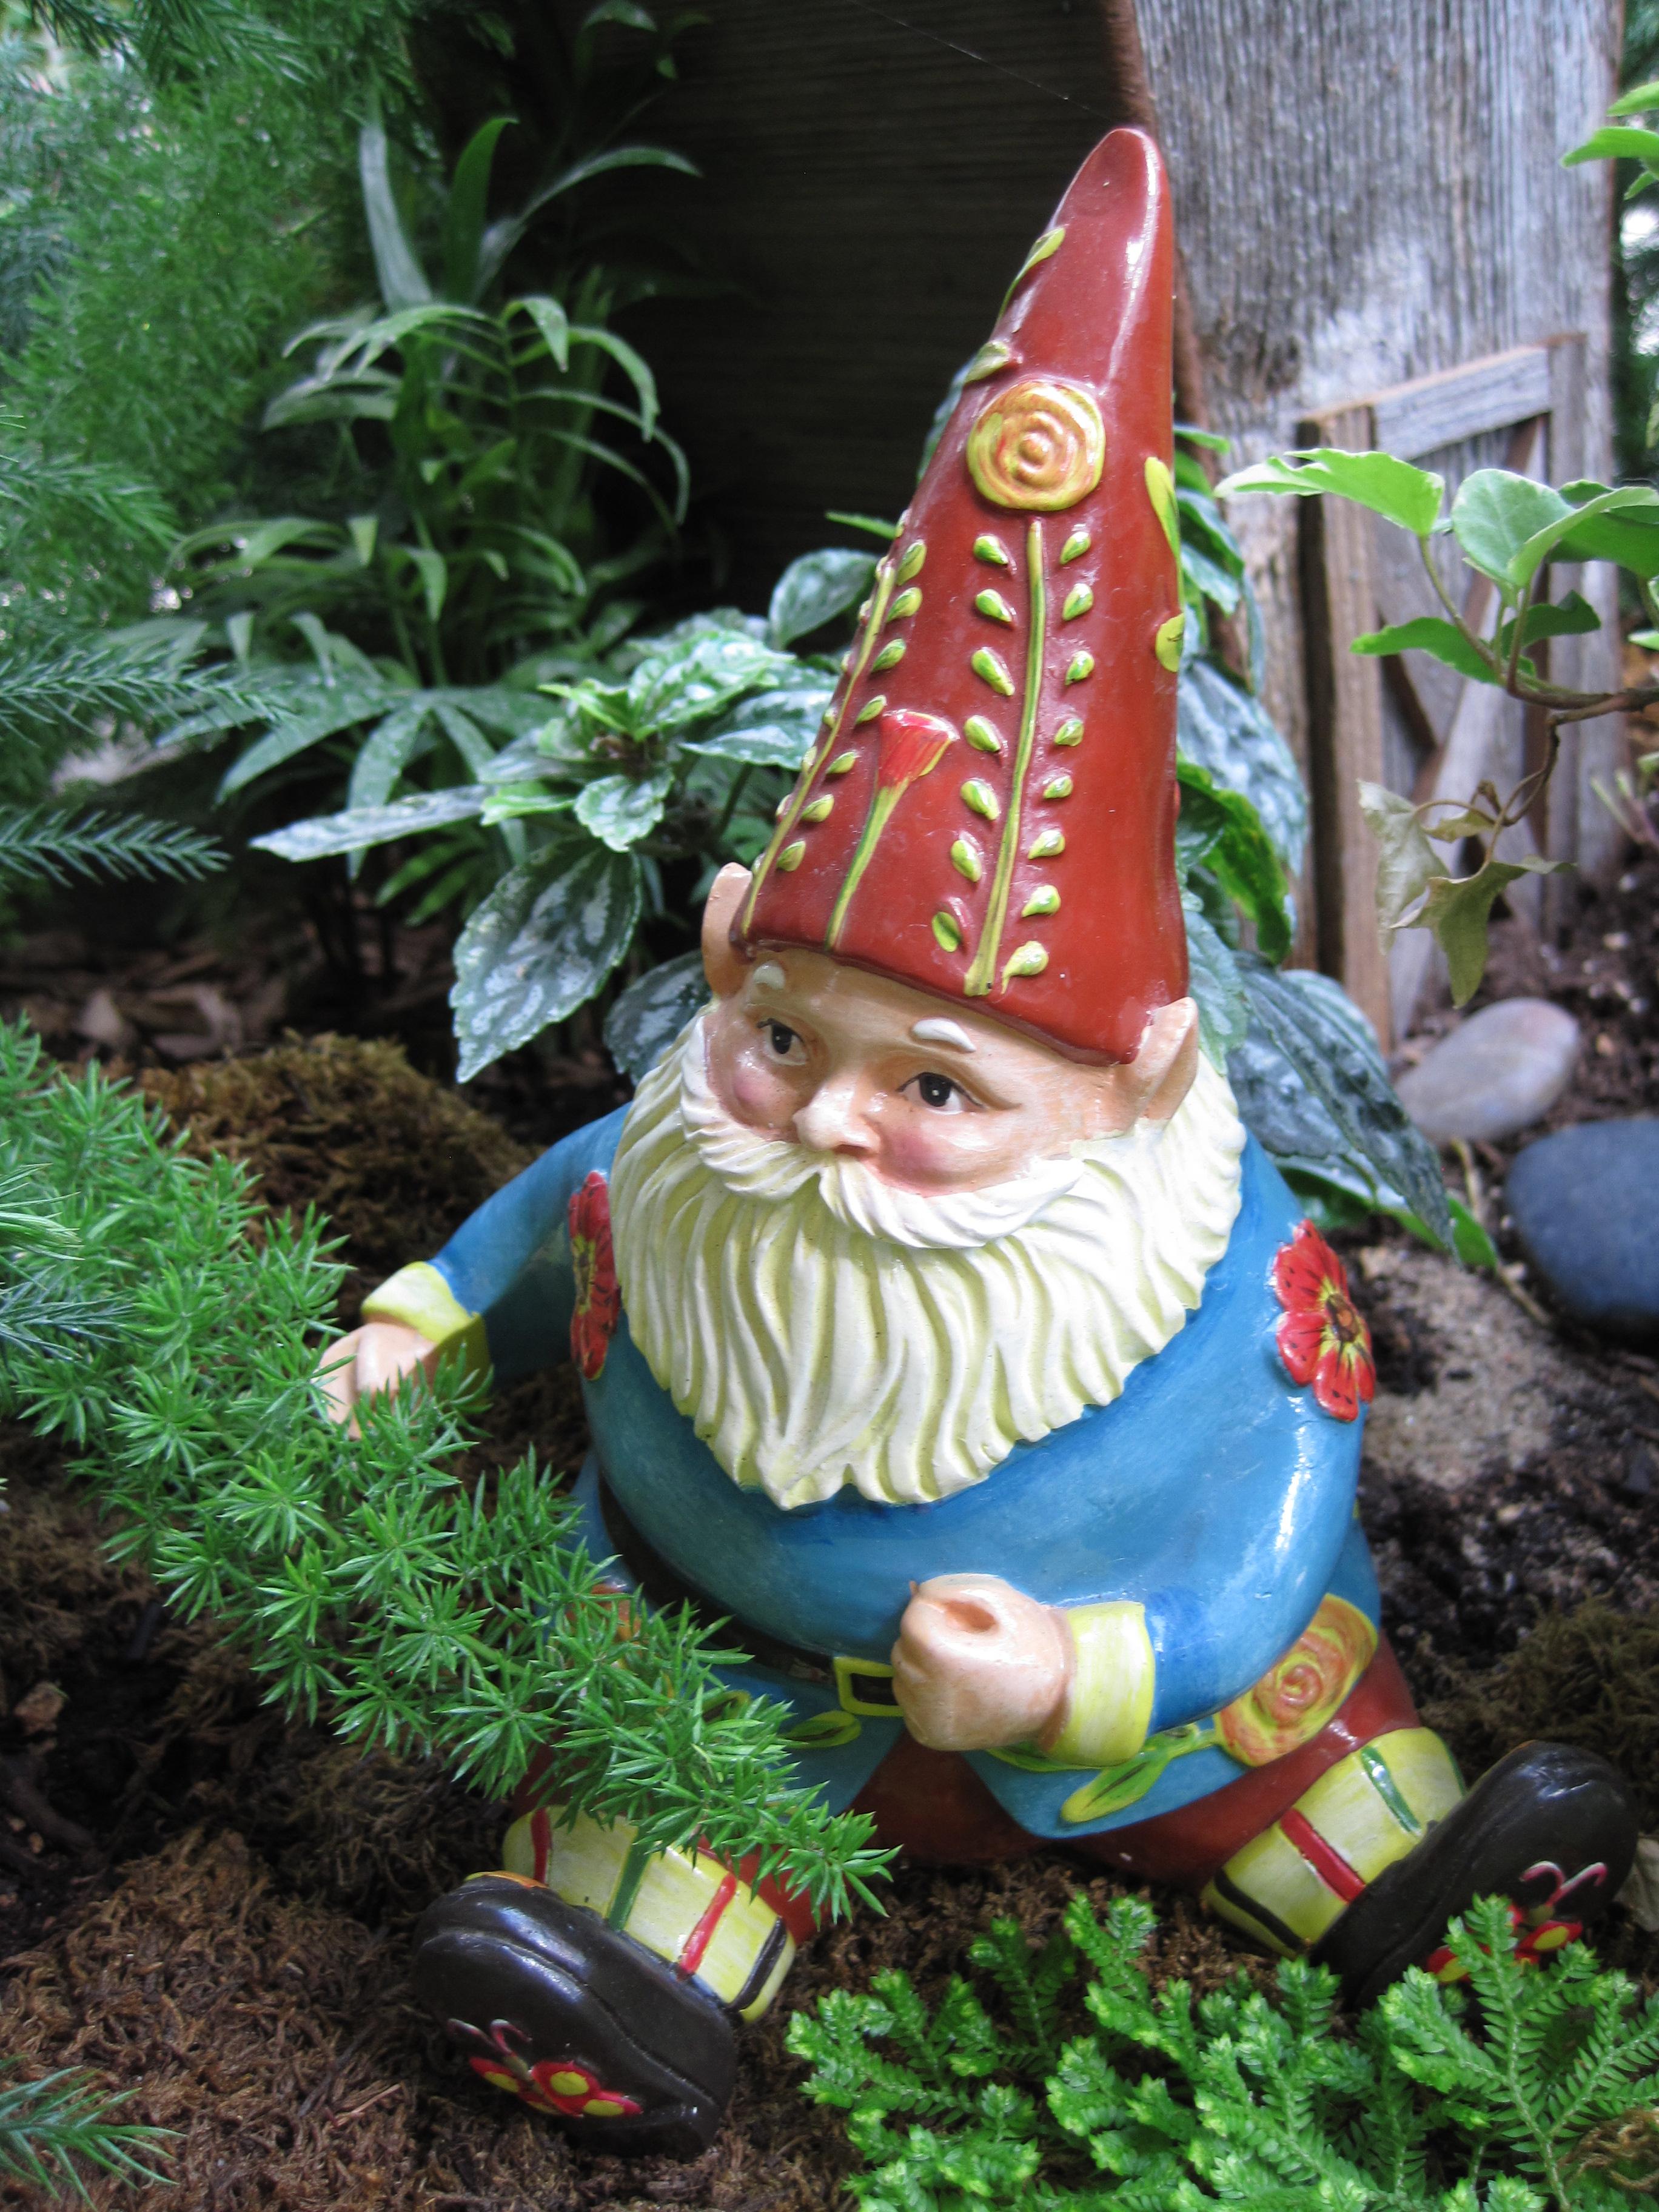 small ball chair hideaway sleeper miniature fairy garden accessories | otten bros. center and landscaping